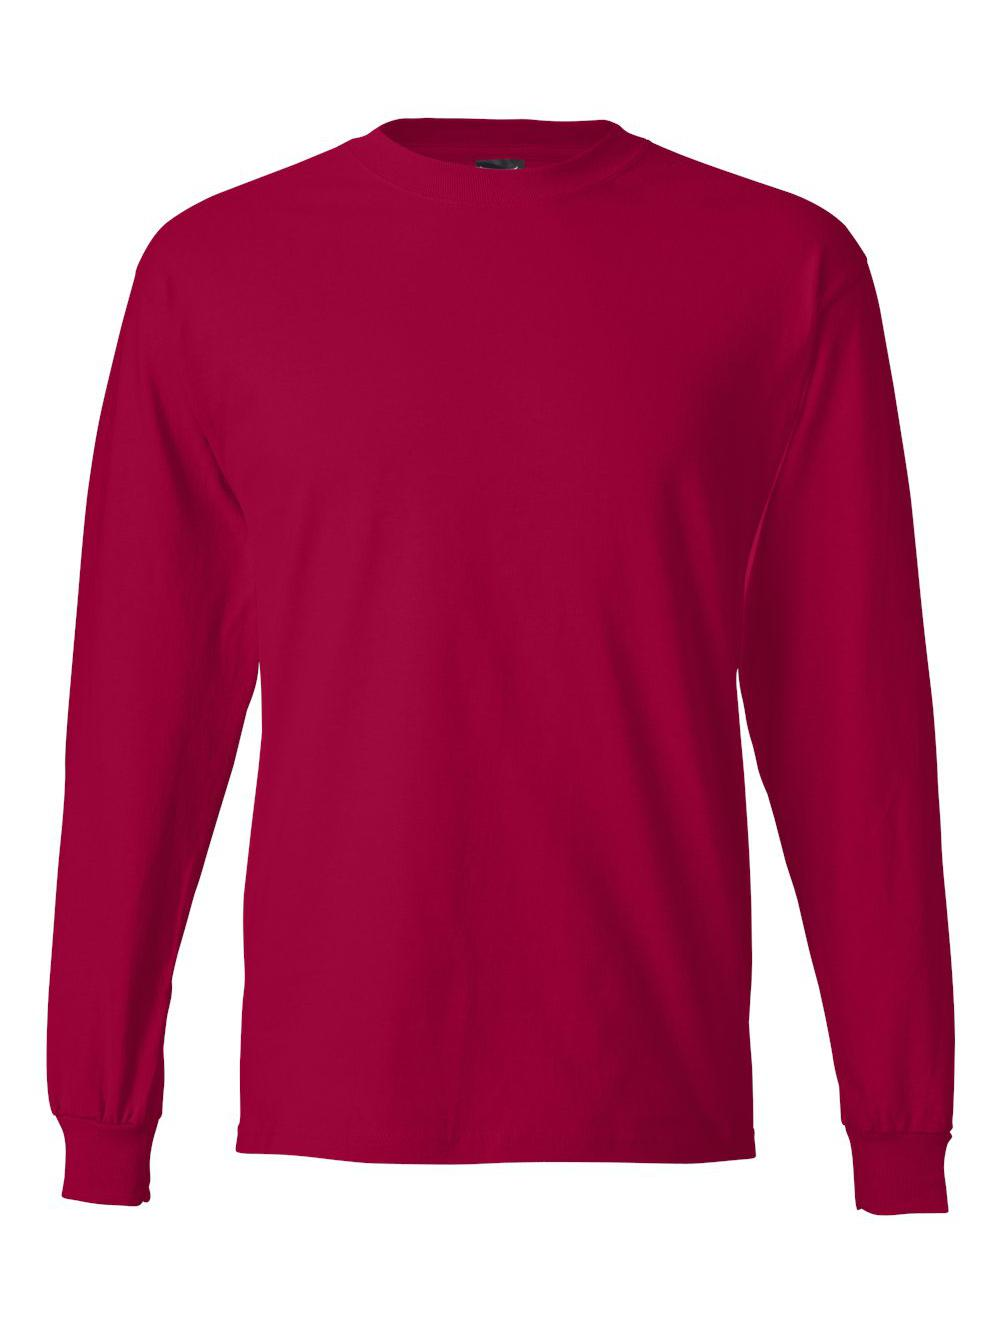 Hanes-Beefy-T-Long-Sleeve-T-Shirt-5186 thumbnail 27